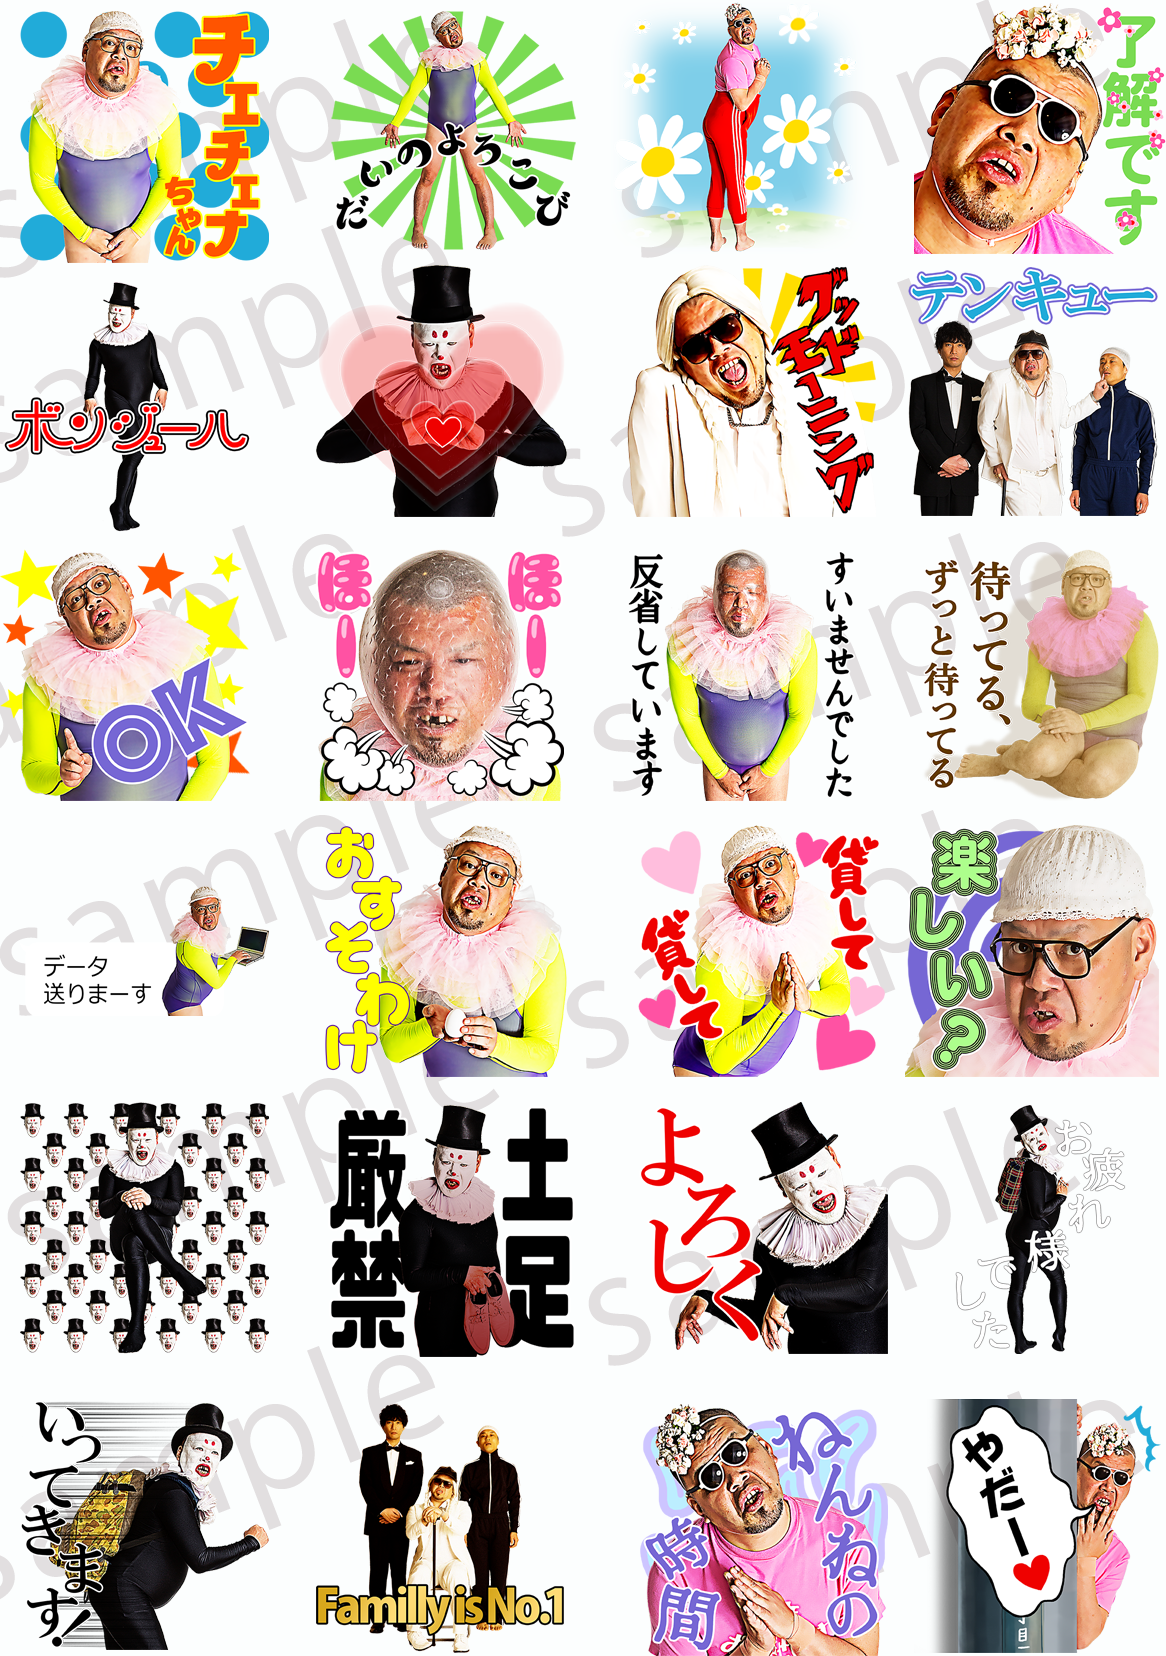 http://news.yoshimoto.co.jp/20170627115845-f4eb41404d9d586752827d02e09355242395db2e.png